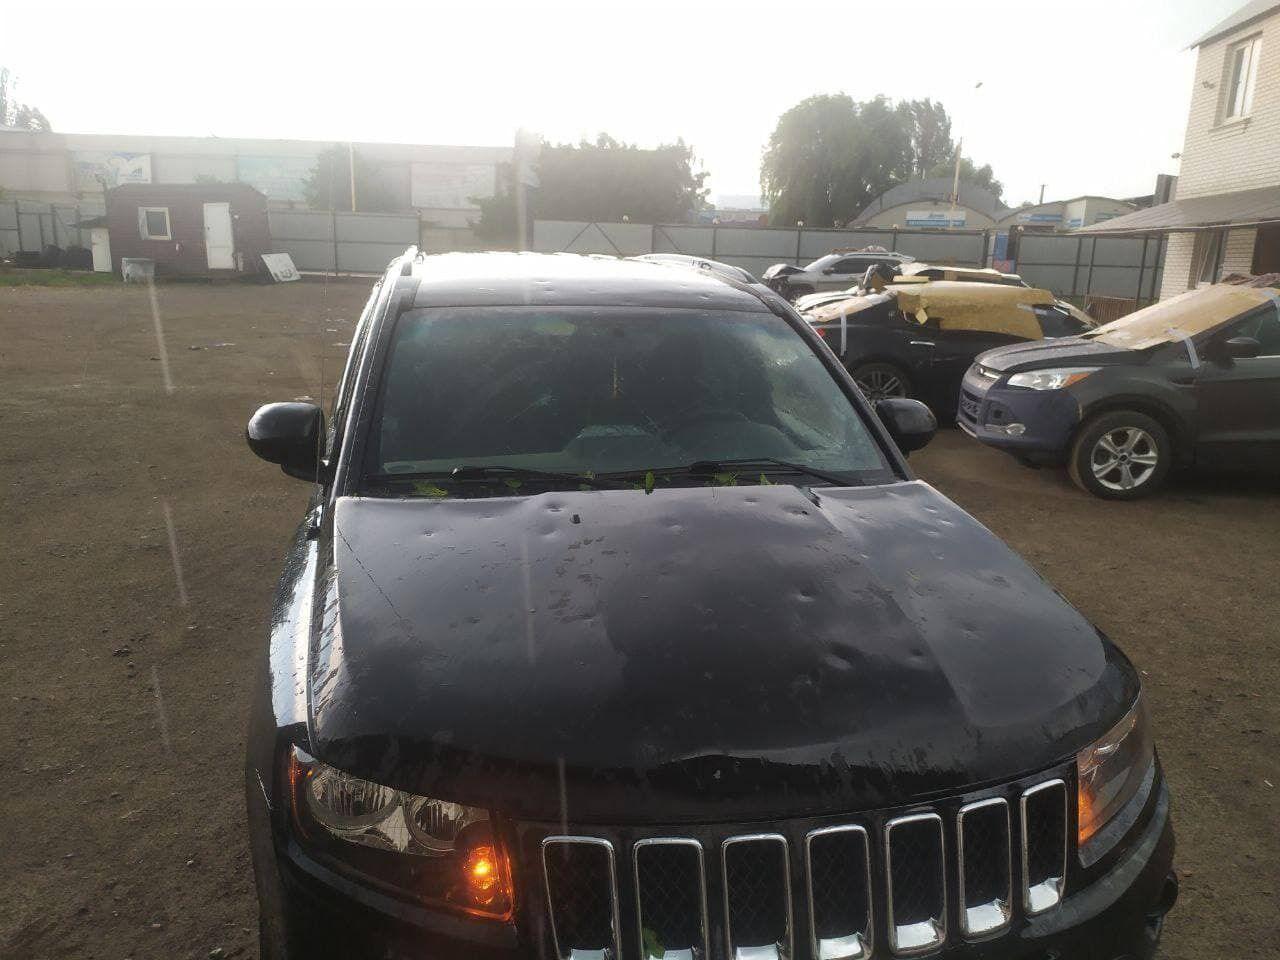 Град повредил автомобиль в Боярке.